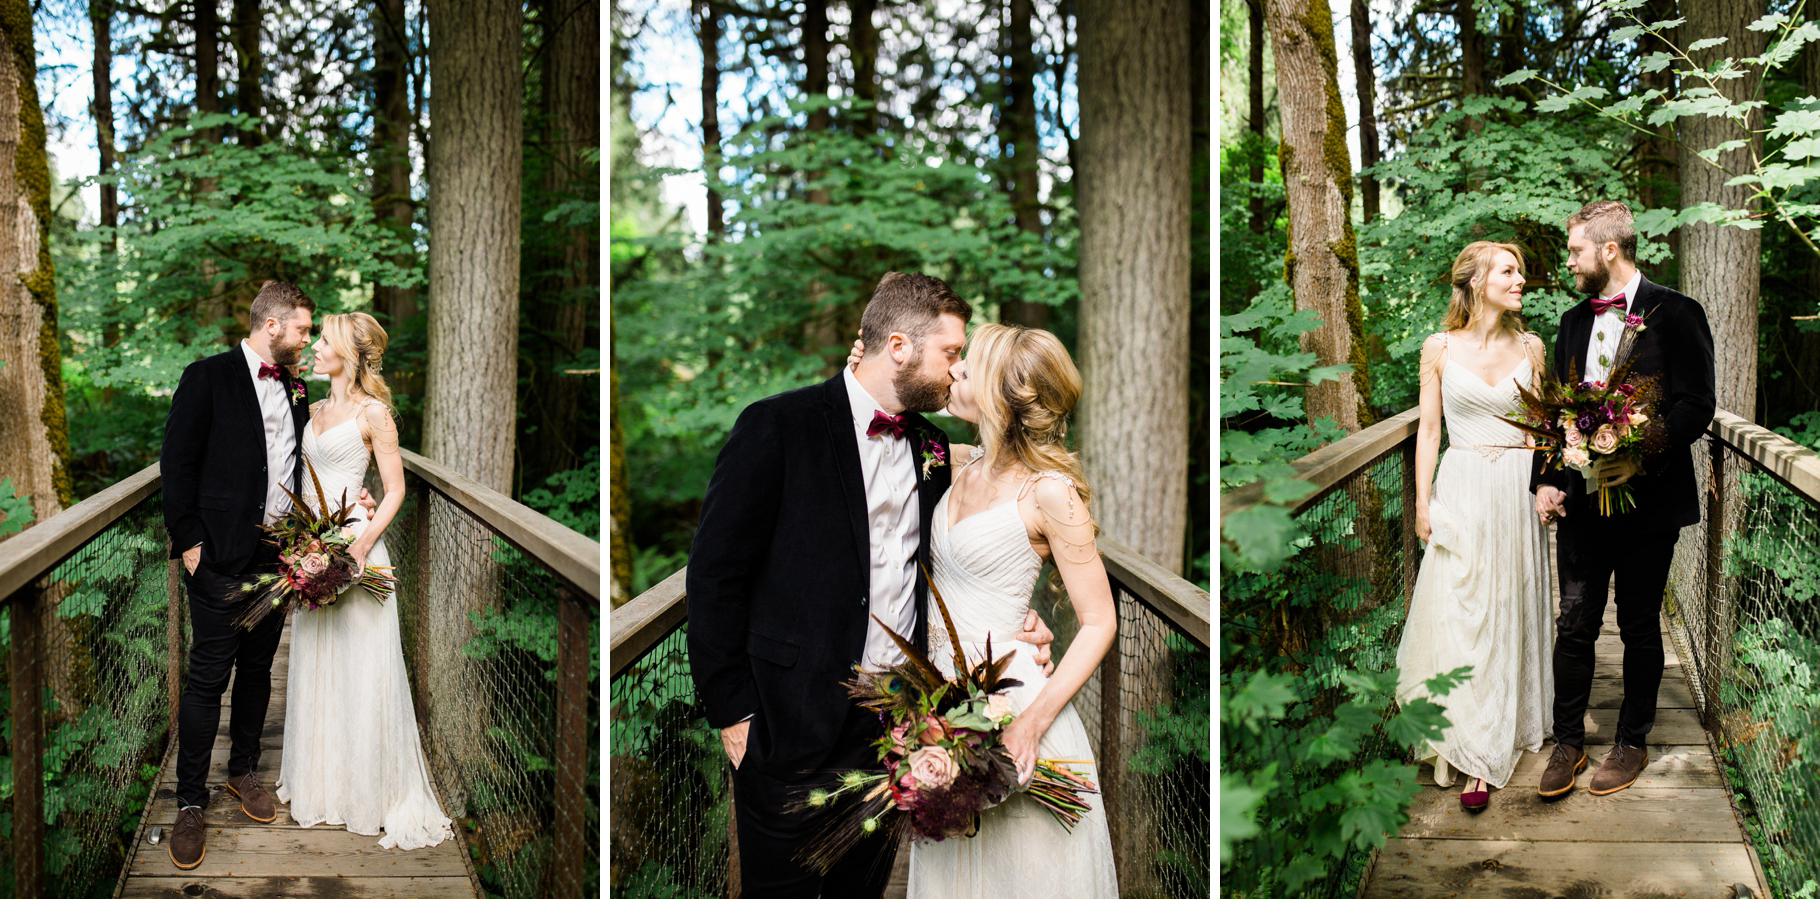 4-Treehouse-Point-Elopement-Seattle-Wedding-Photographer